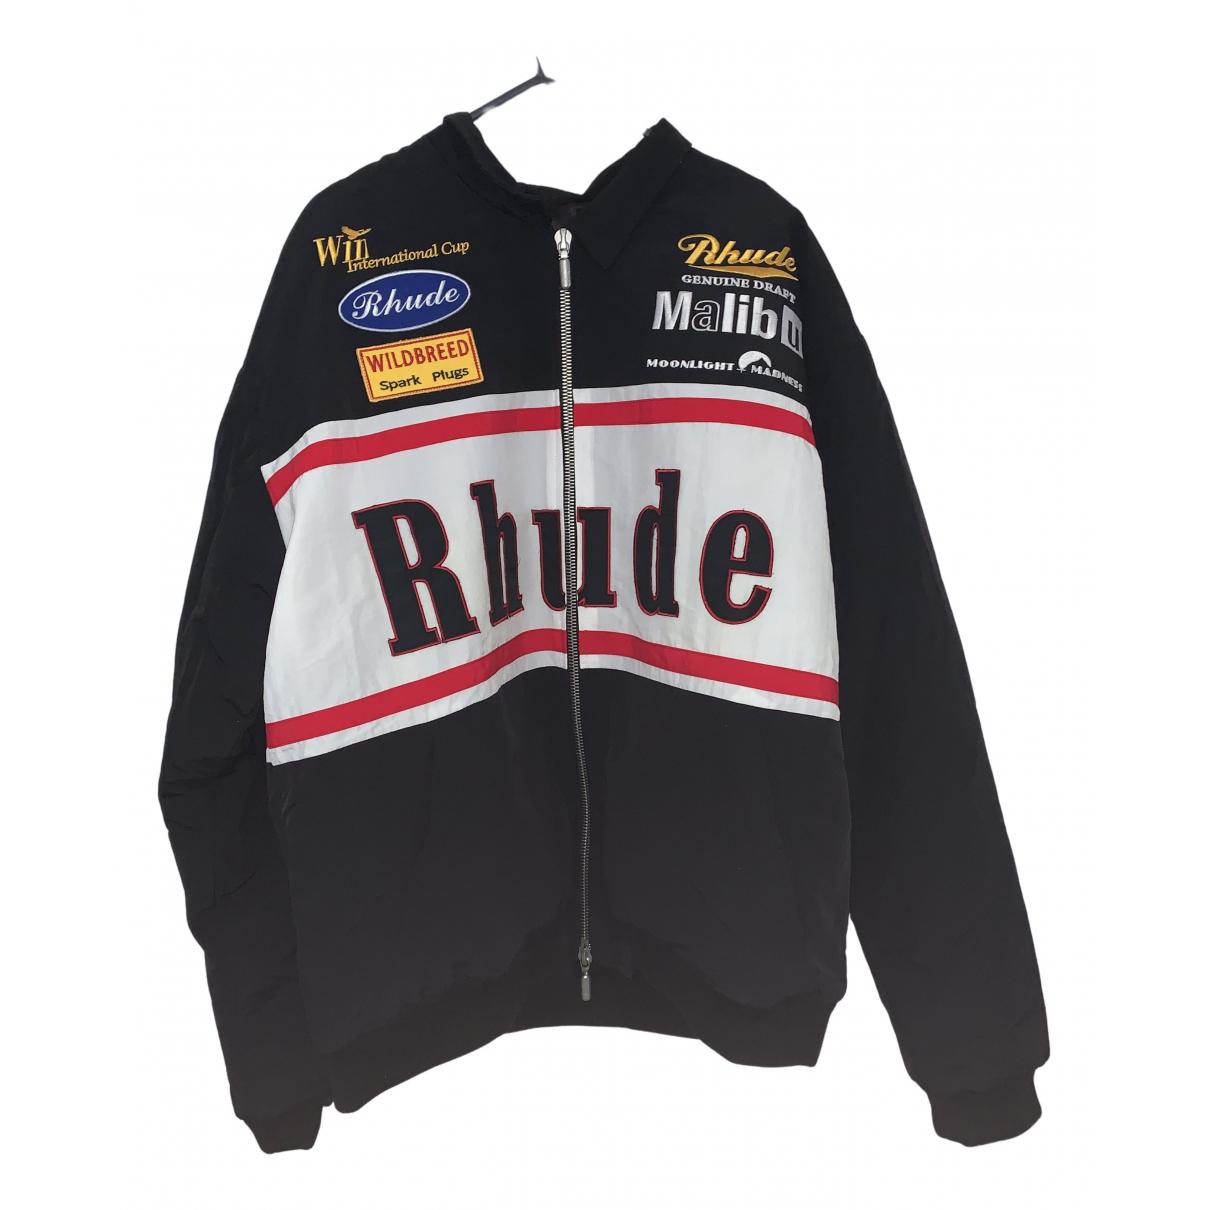 Rhude N Black Cotton jacket  for Men XL International